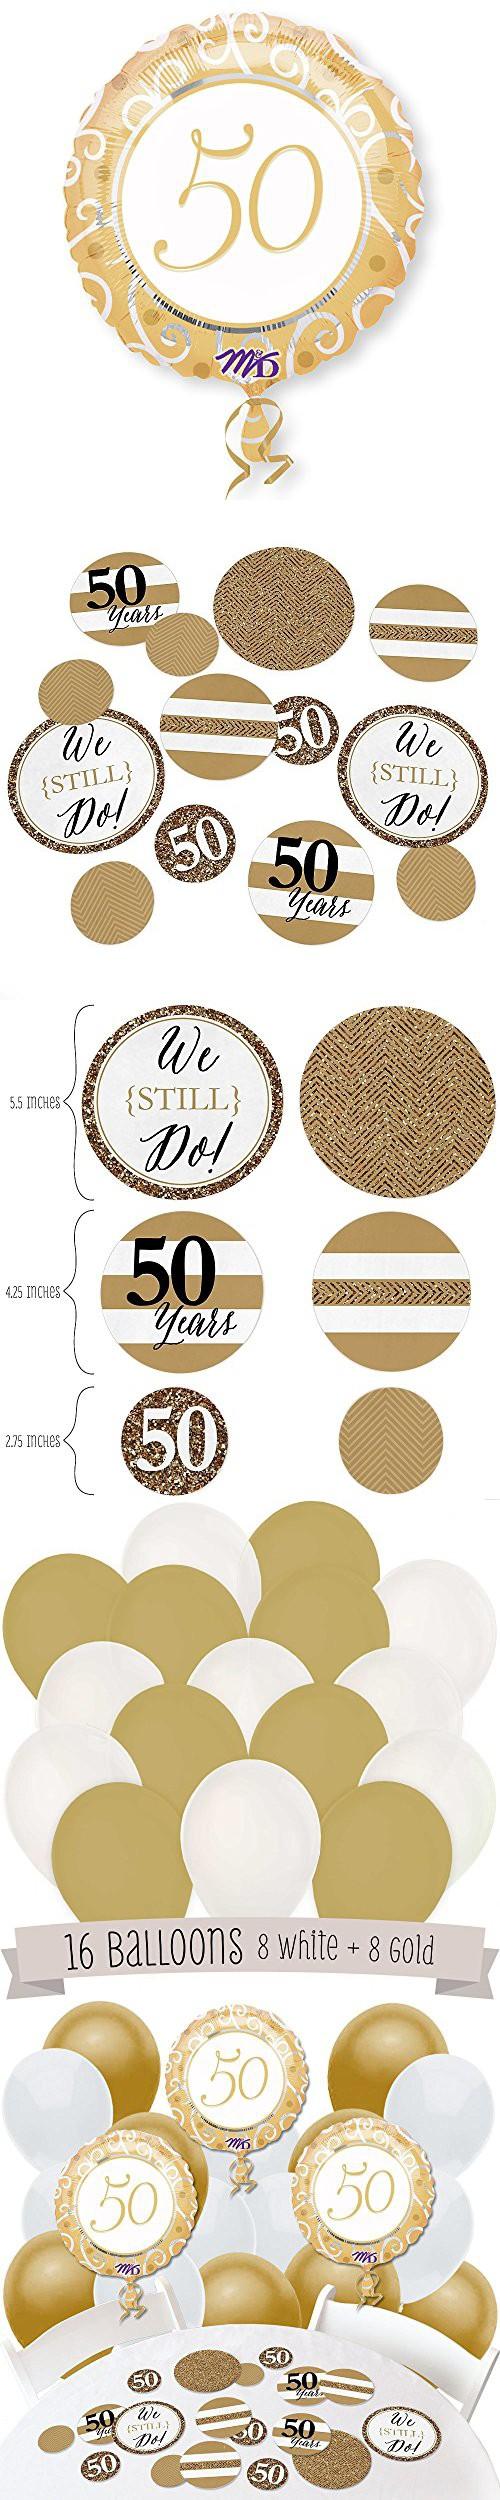 We Still Do - 50th Wedding Anniversary - Confetti and Balloon ...